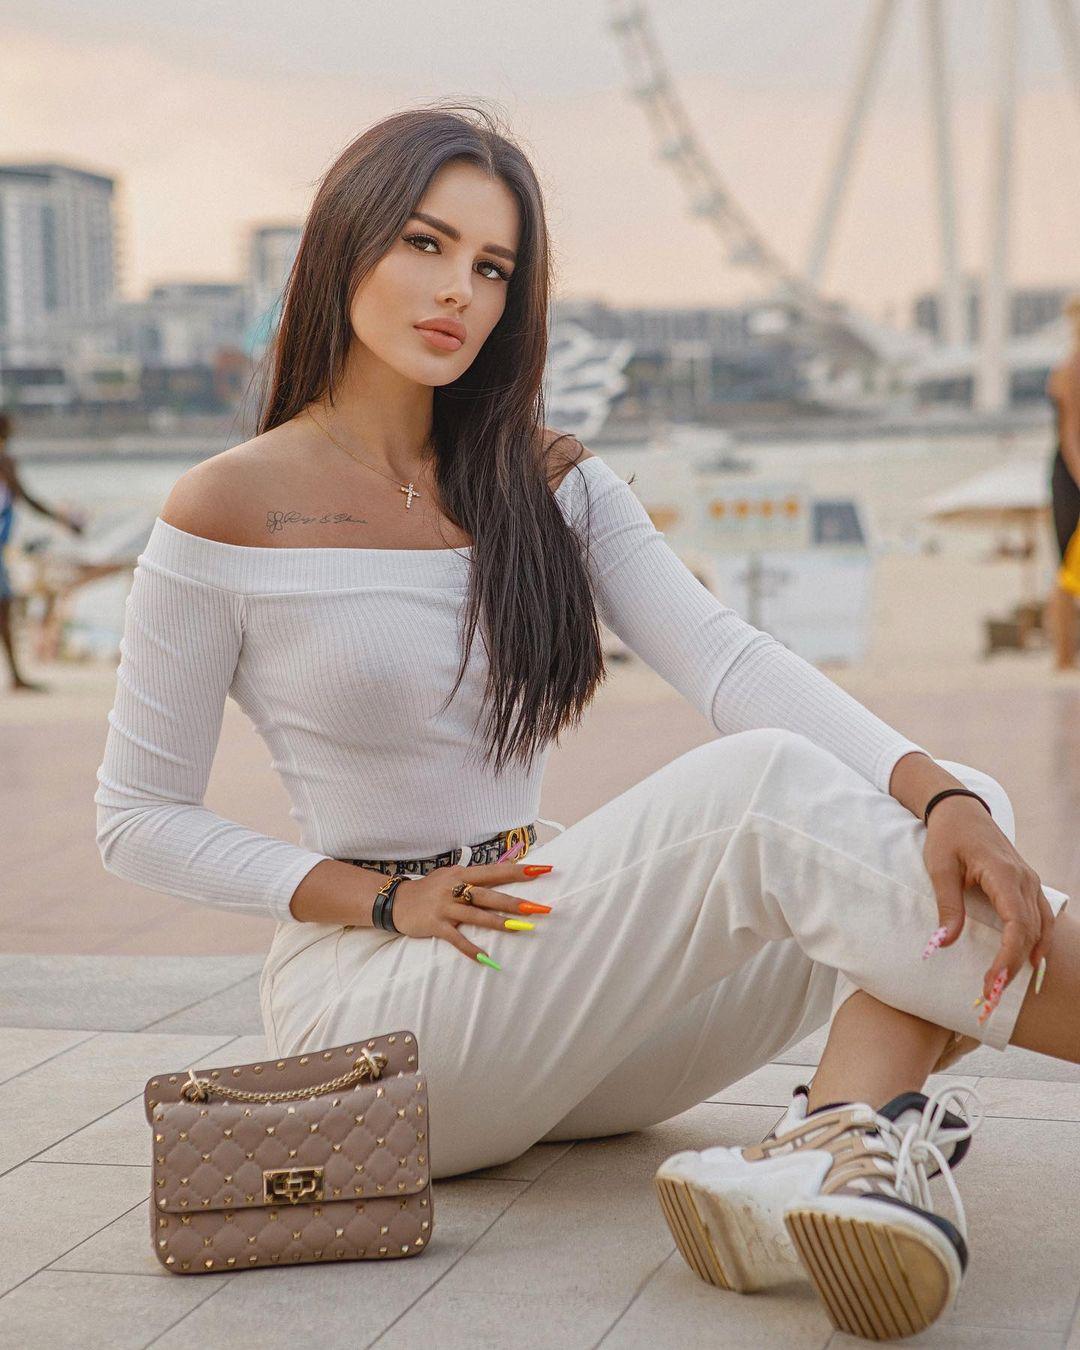 Karina-Arakelyan-Wallpapers-Insta-Fit-Bio-5